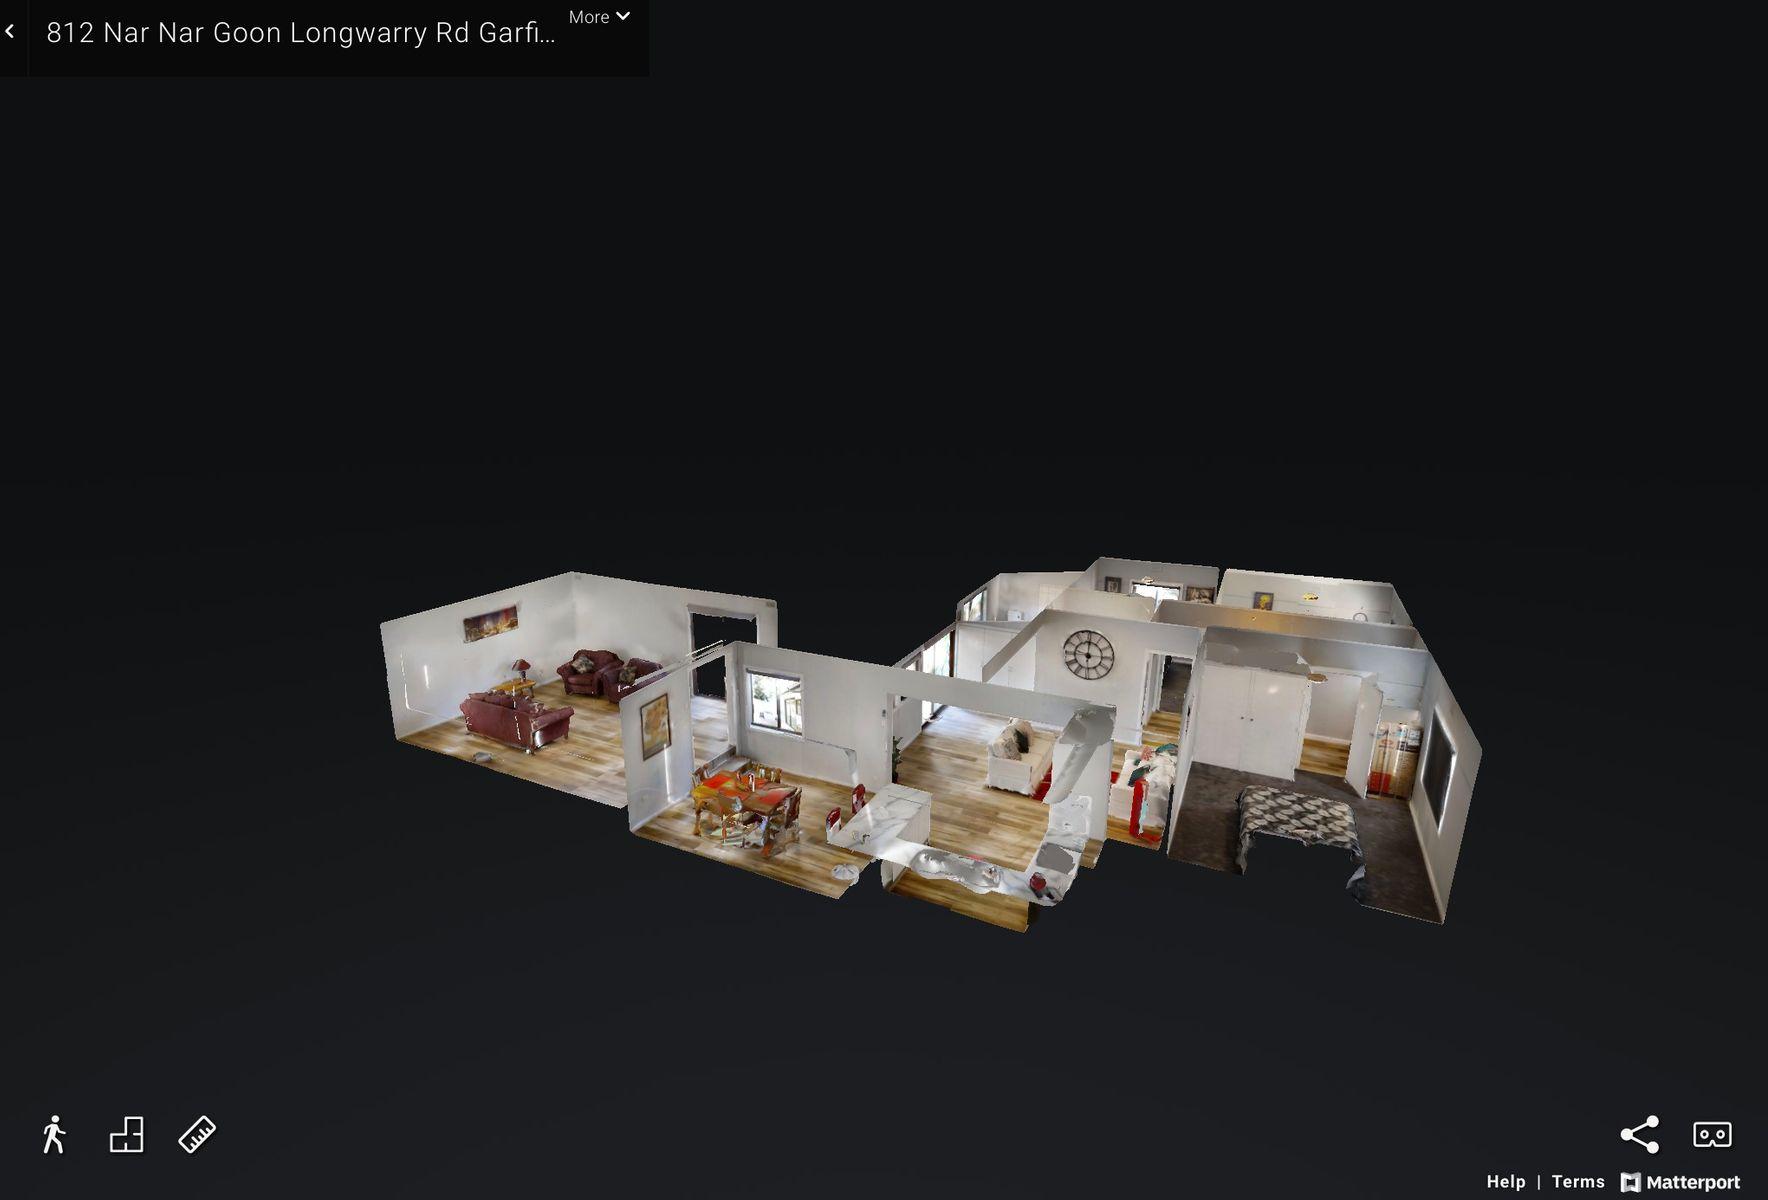 812 Nar Nar Goon-Longwarry Road, Garfield, VIC 3814